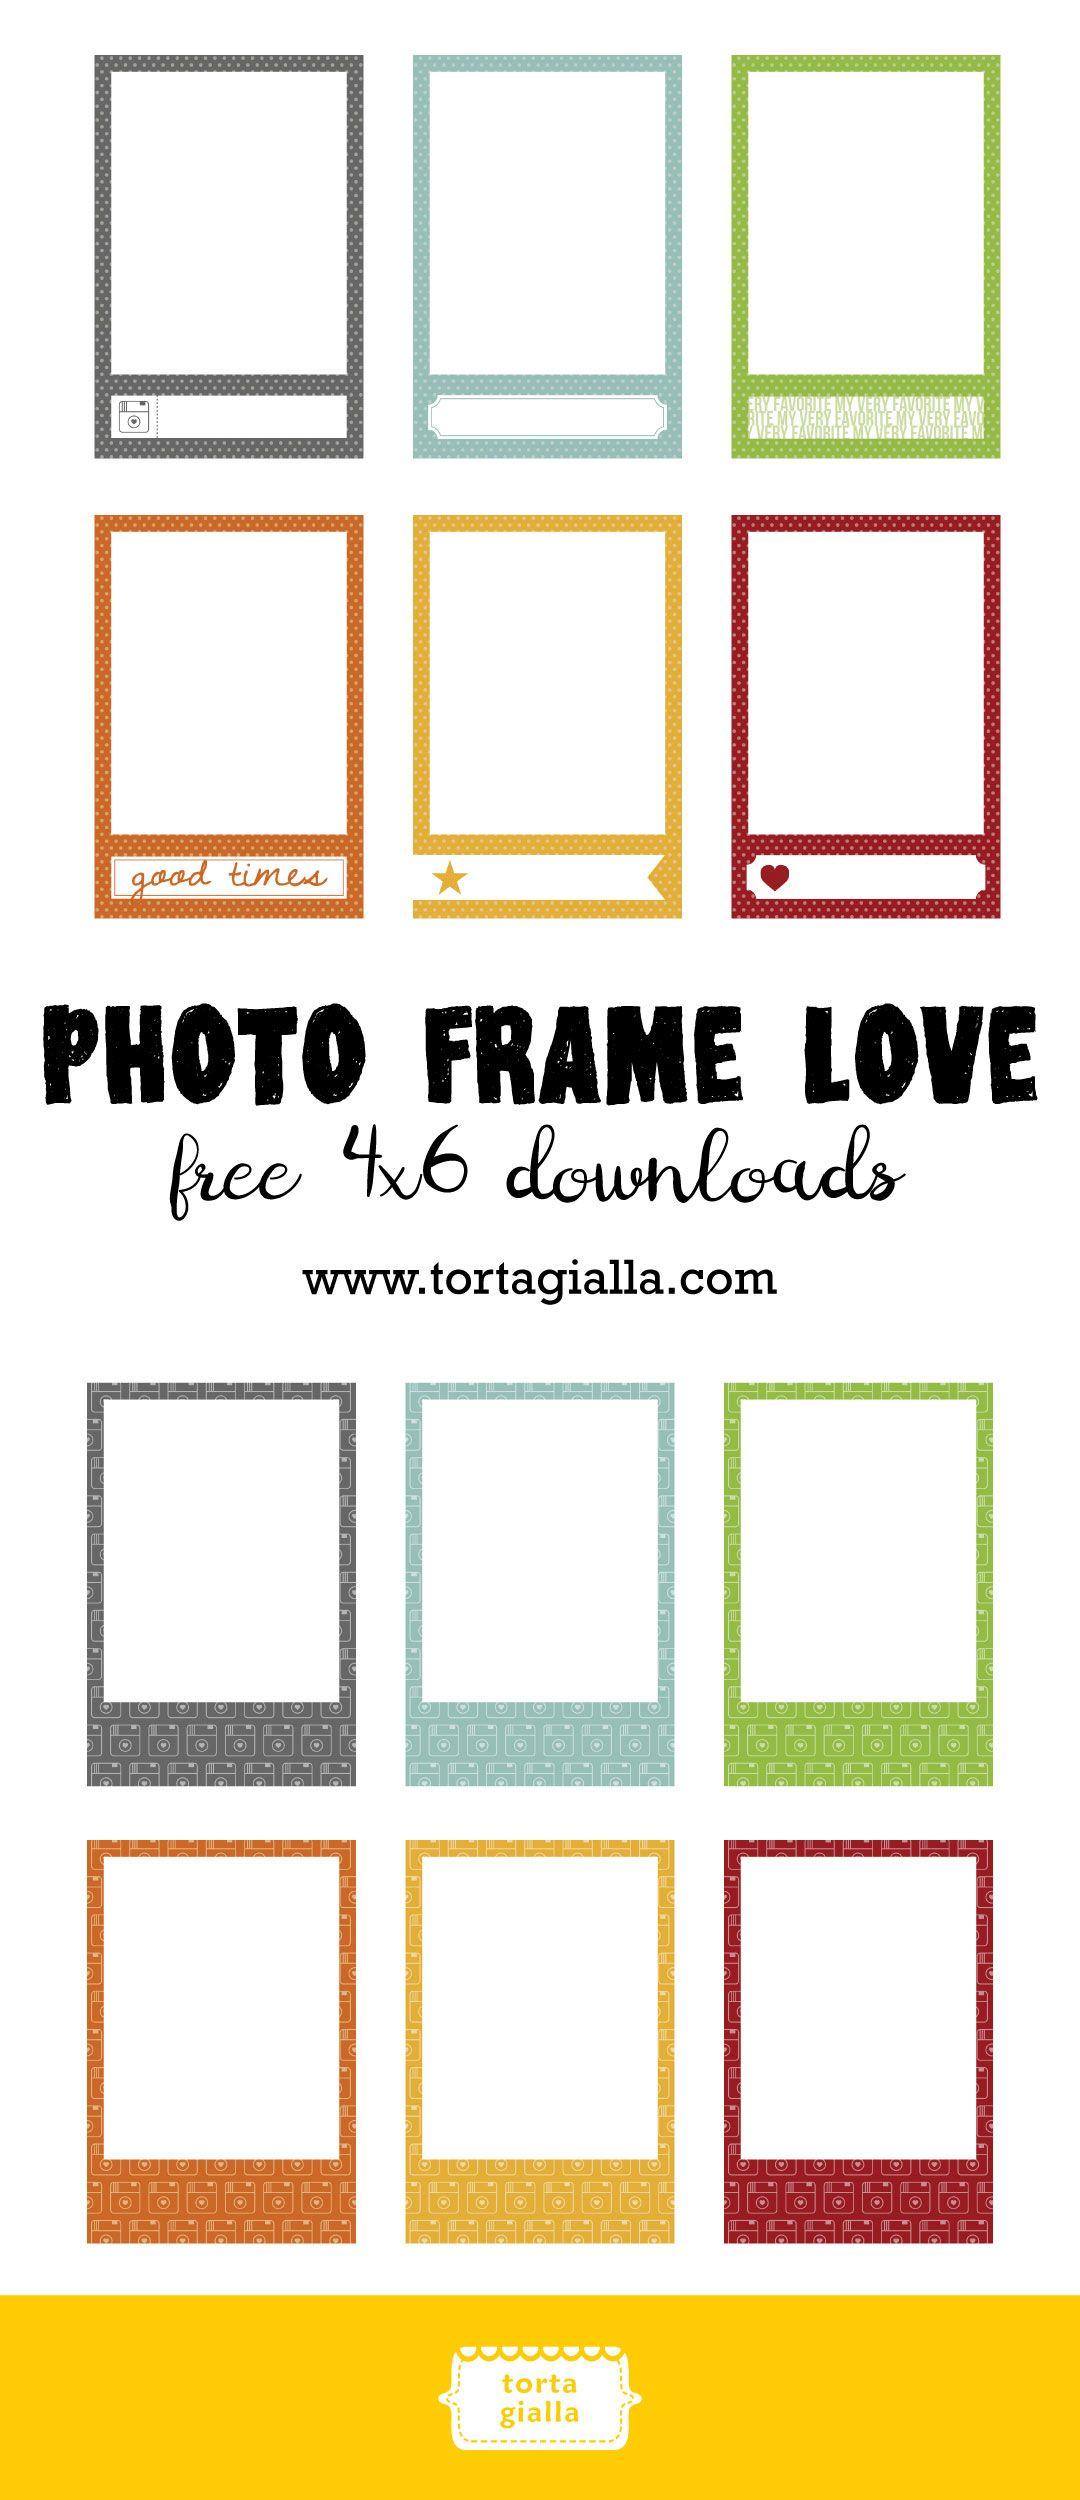 Free 4x6 Photo Frame Love Downloads Free Photo Frames Photo